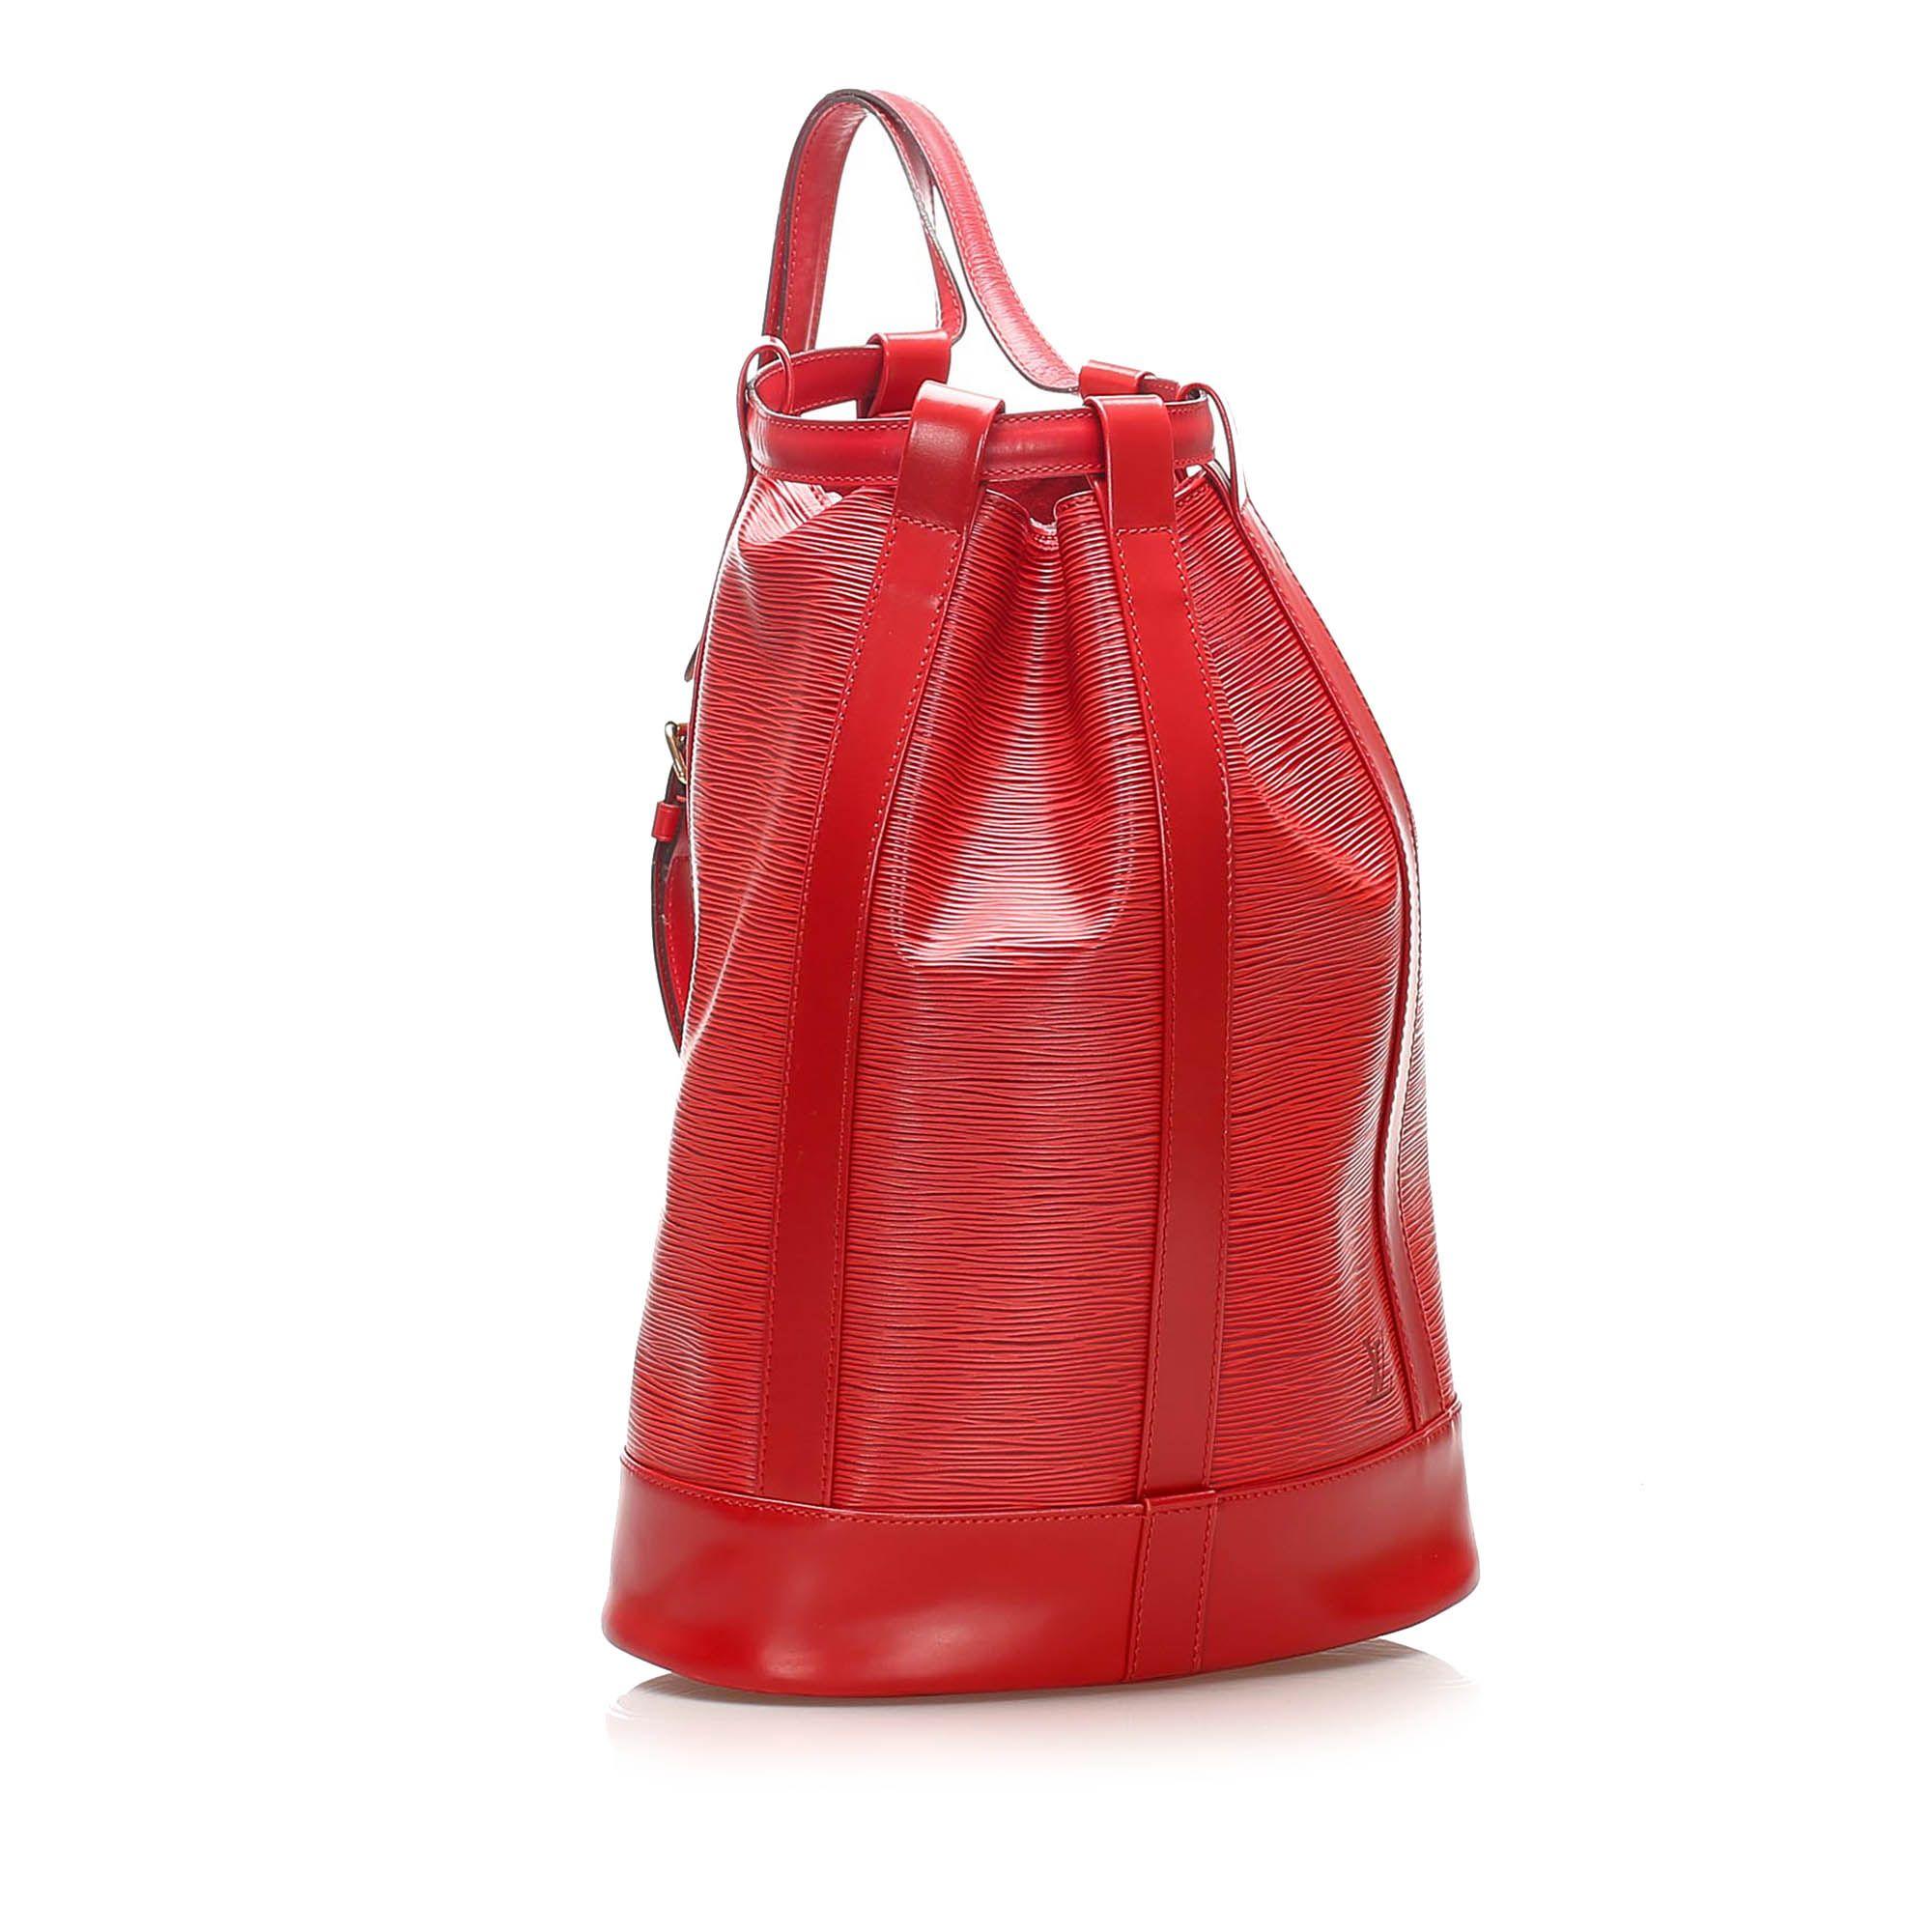 Vintage Louis Vuitton Epi Randonnee PM Red